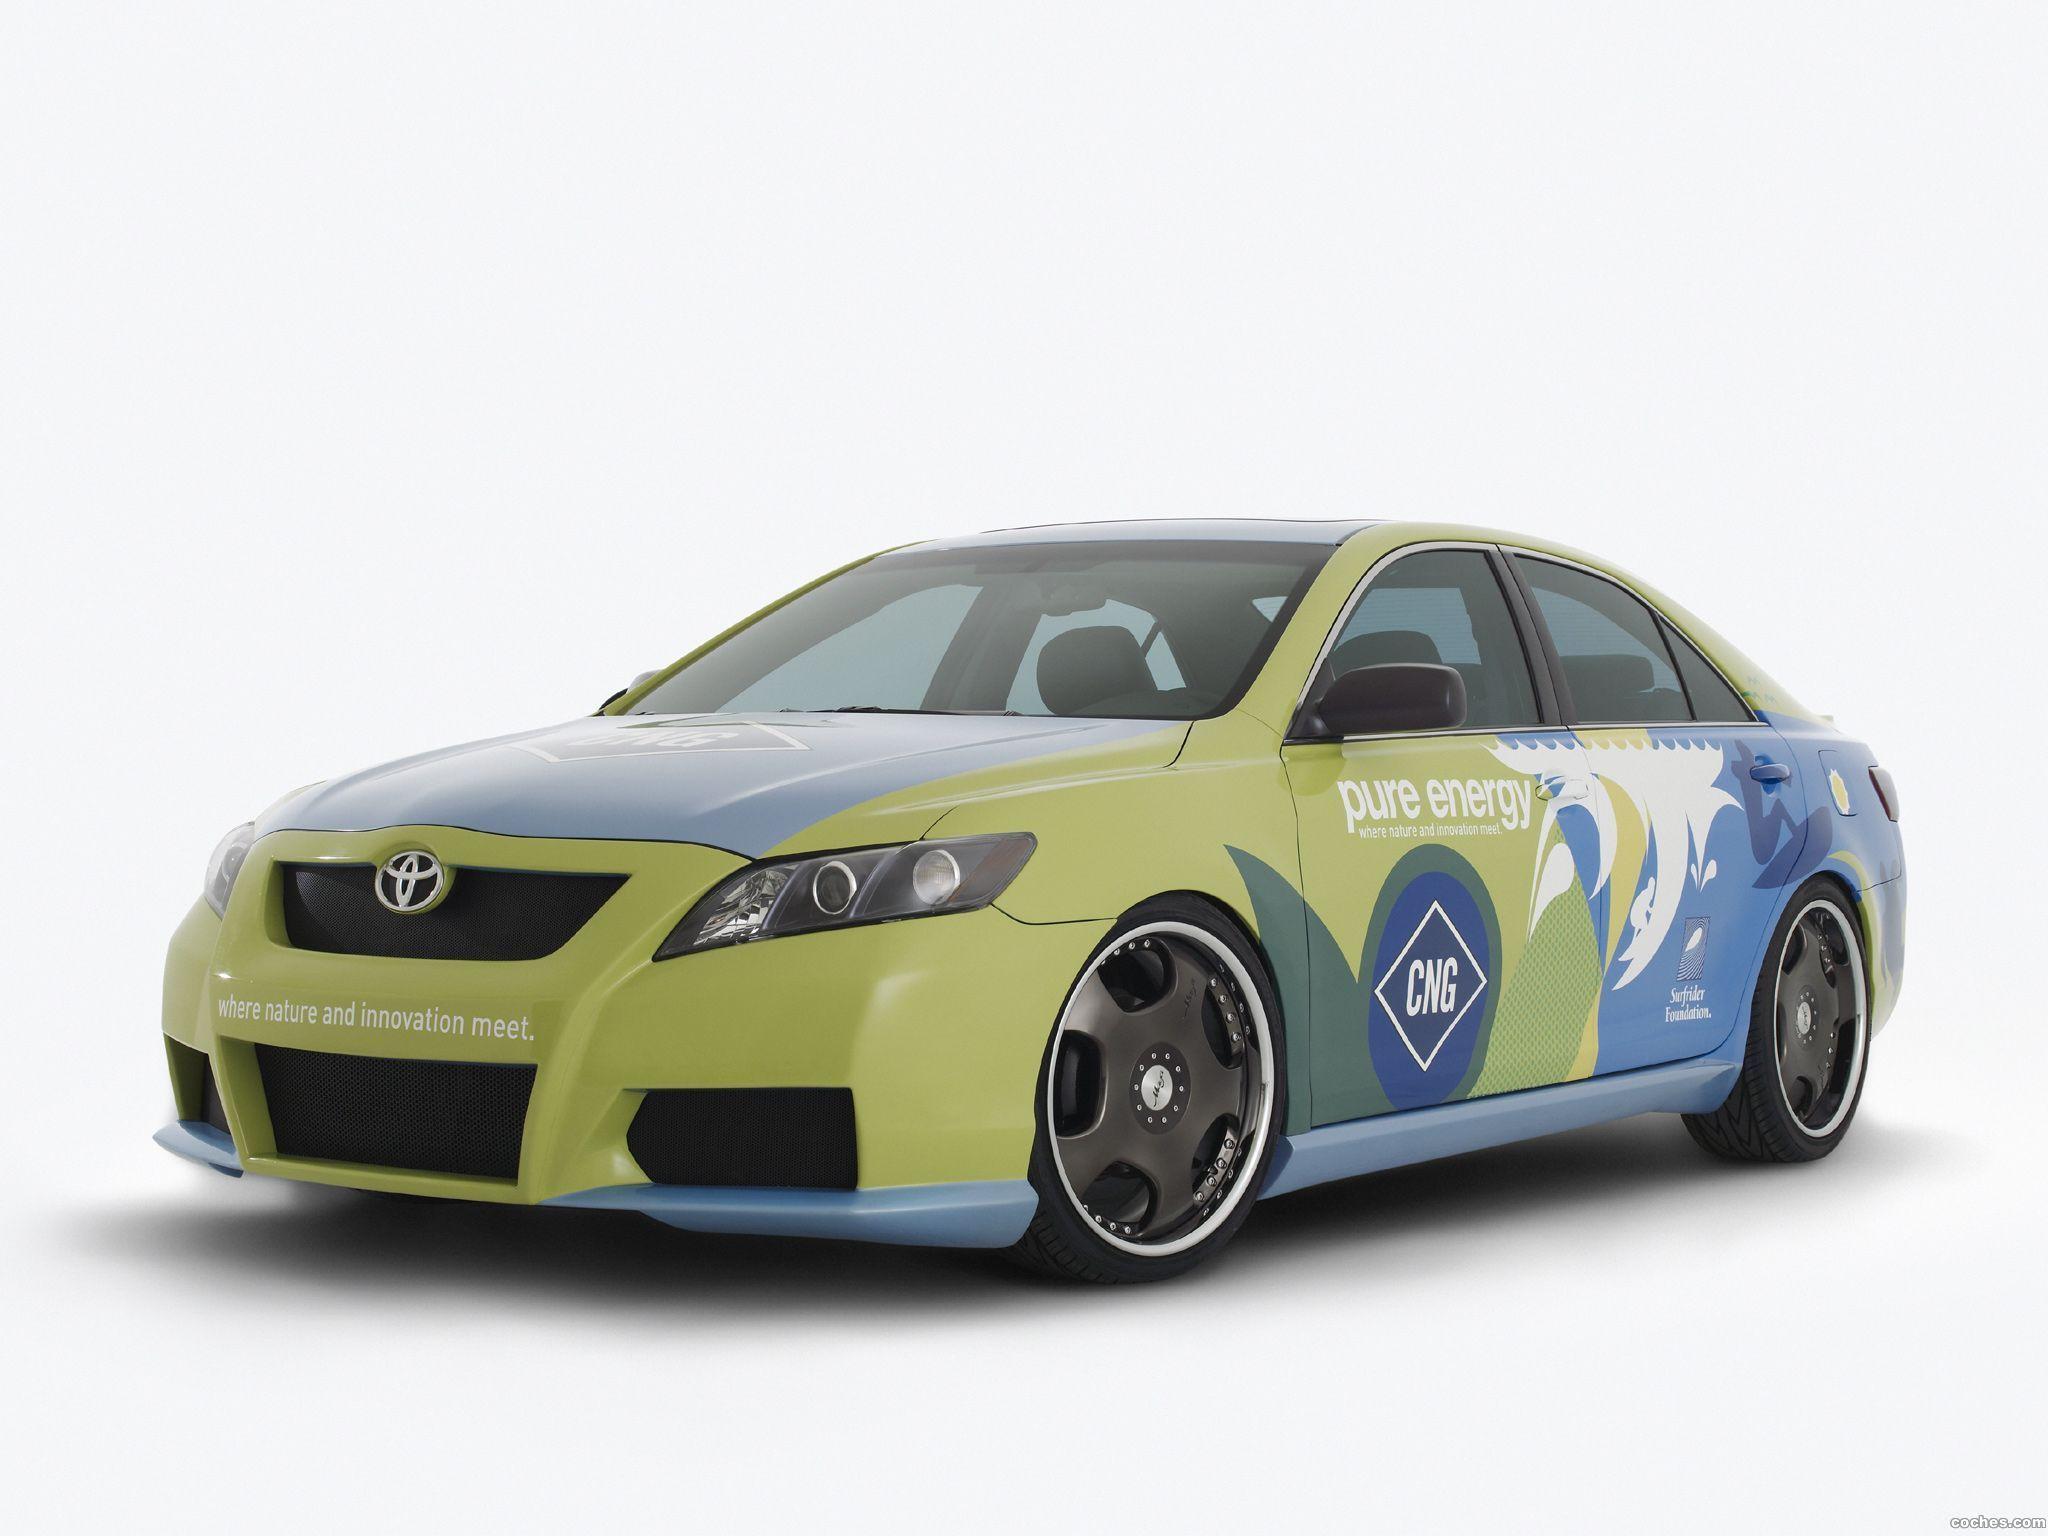 Foto 0 de Toyota Camry Hybrid Surfrider 2009